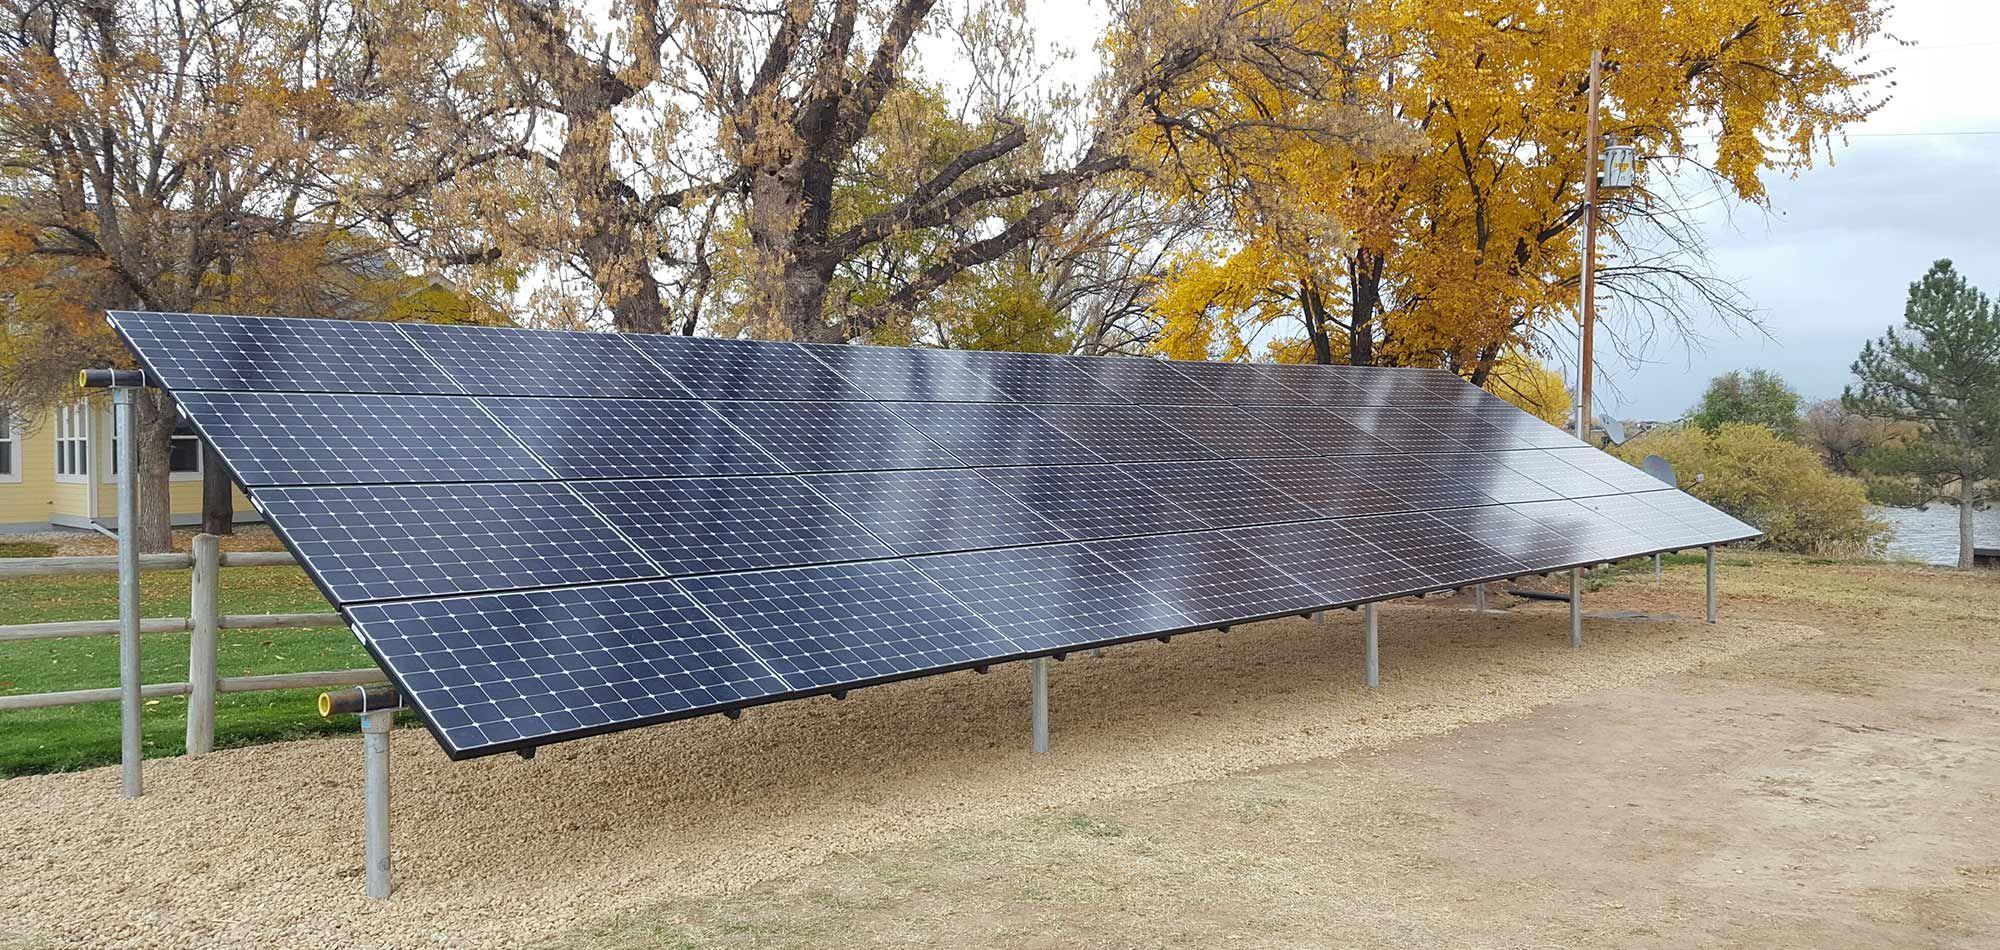 Solar Panel Cost Solarpanelcost Solarpanelroof Homesolarsystem Commercialsolarpanel Solarpanelbusinesstexas Solar Panel Cost Solar Panels Solar